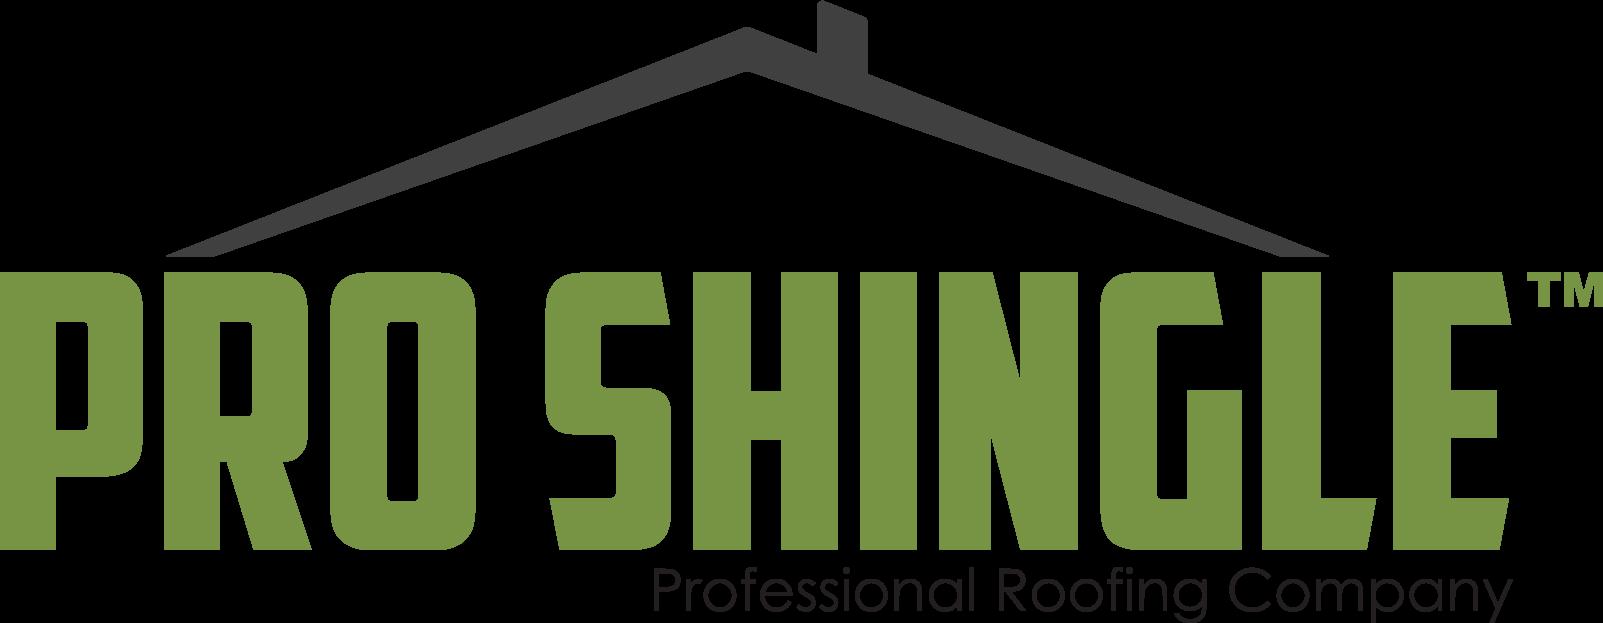 Pro Shingle Roofing